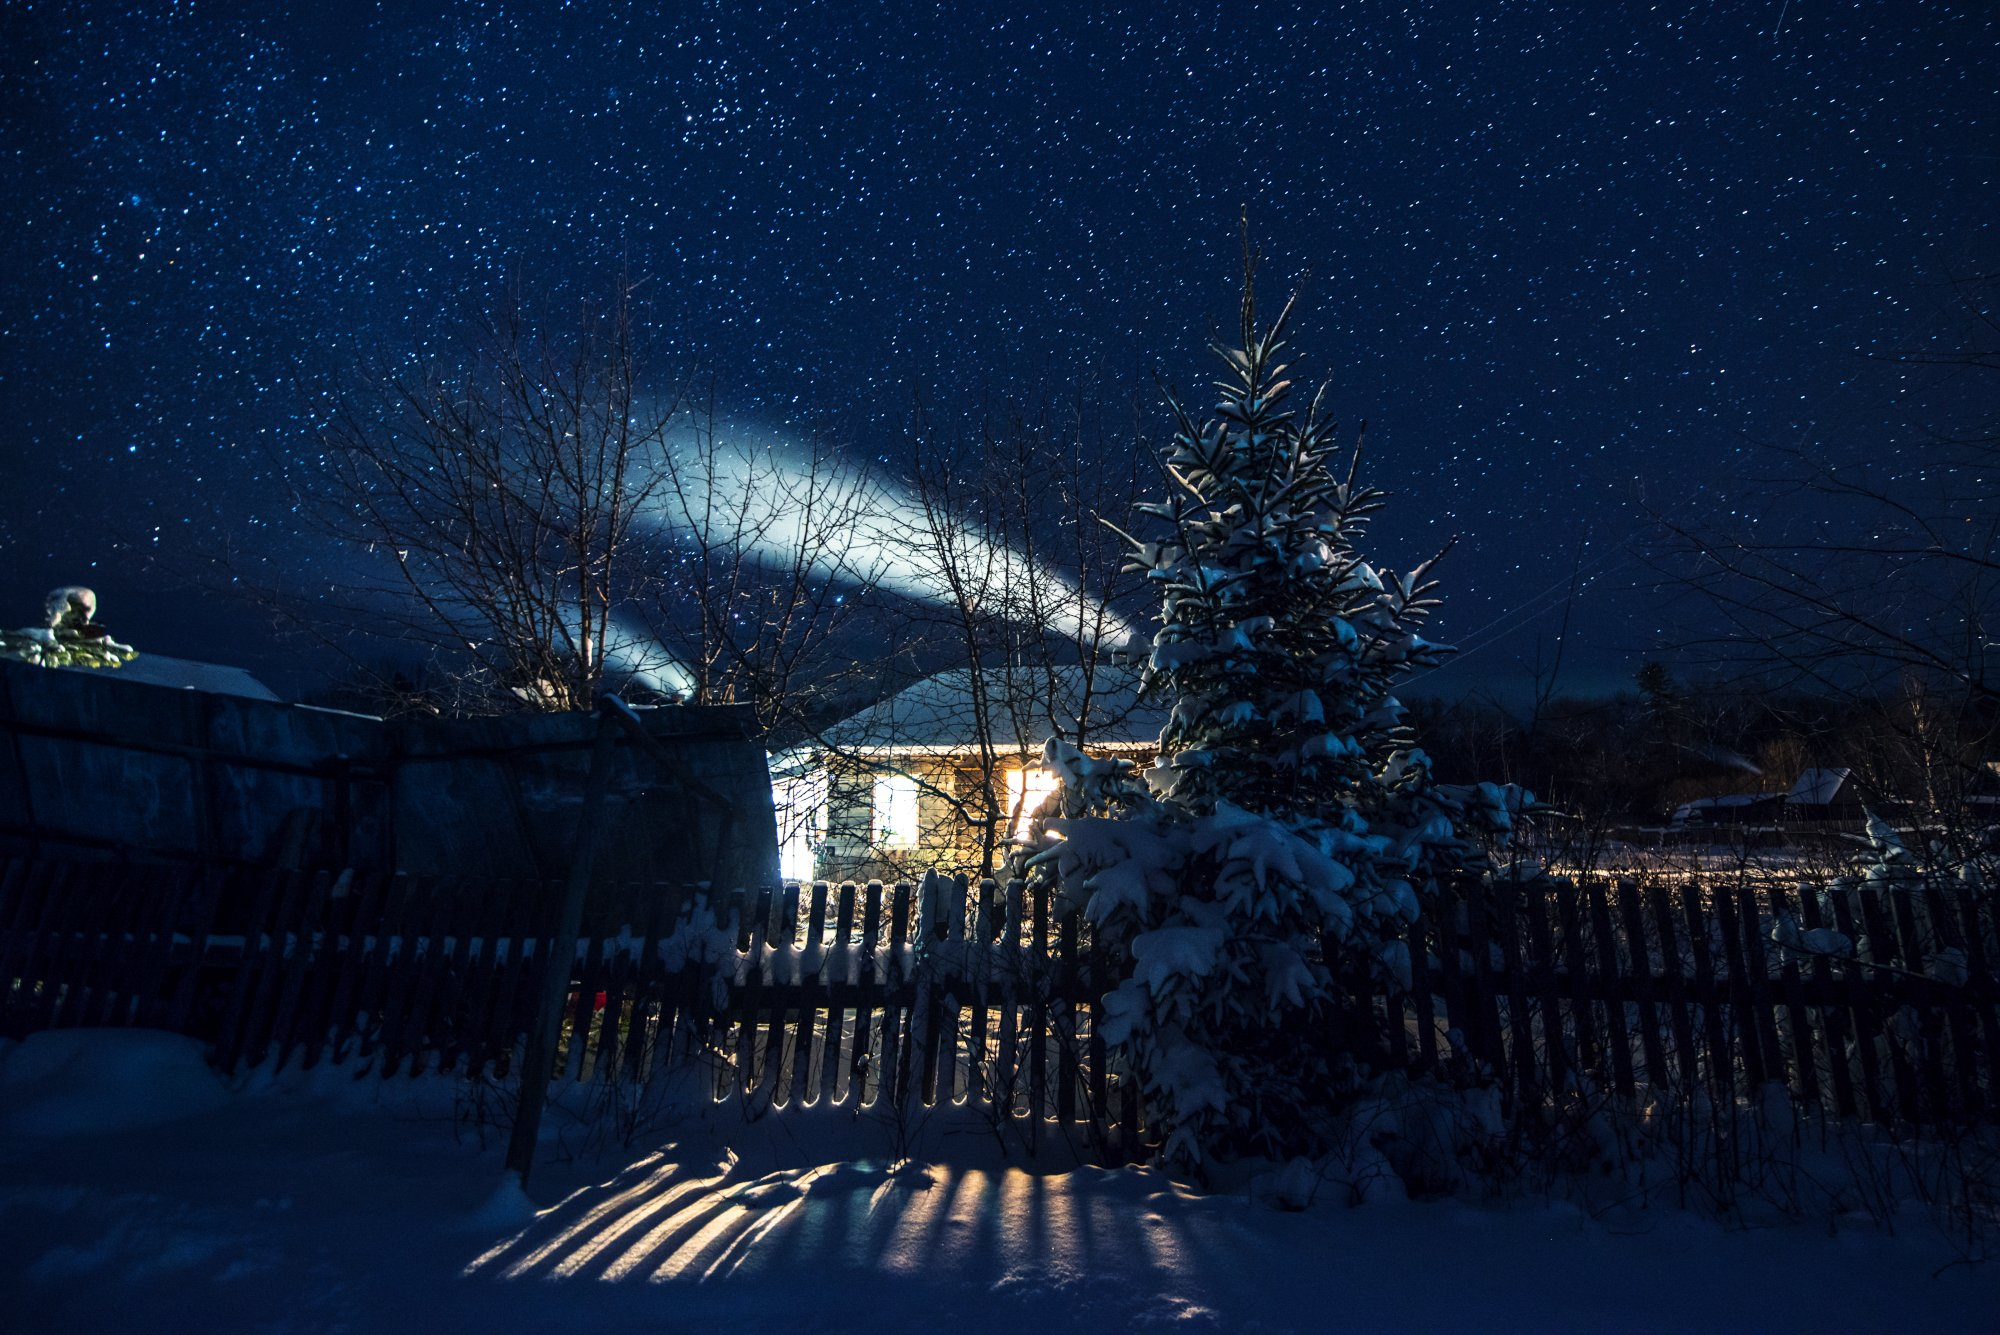 Ночь Звёзды Деревня, Виталий Берков